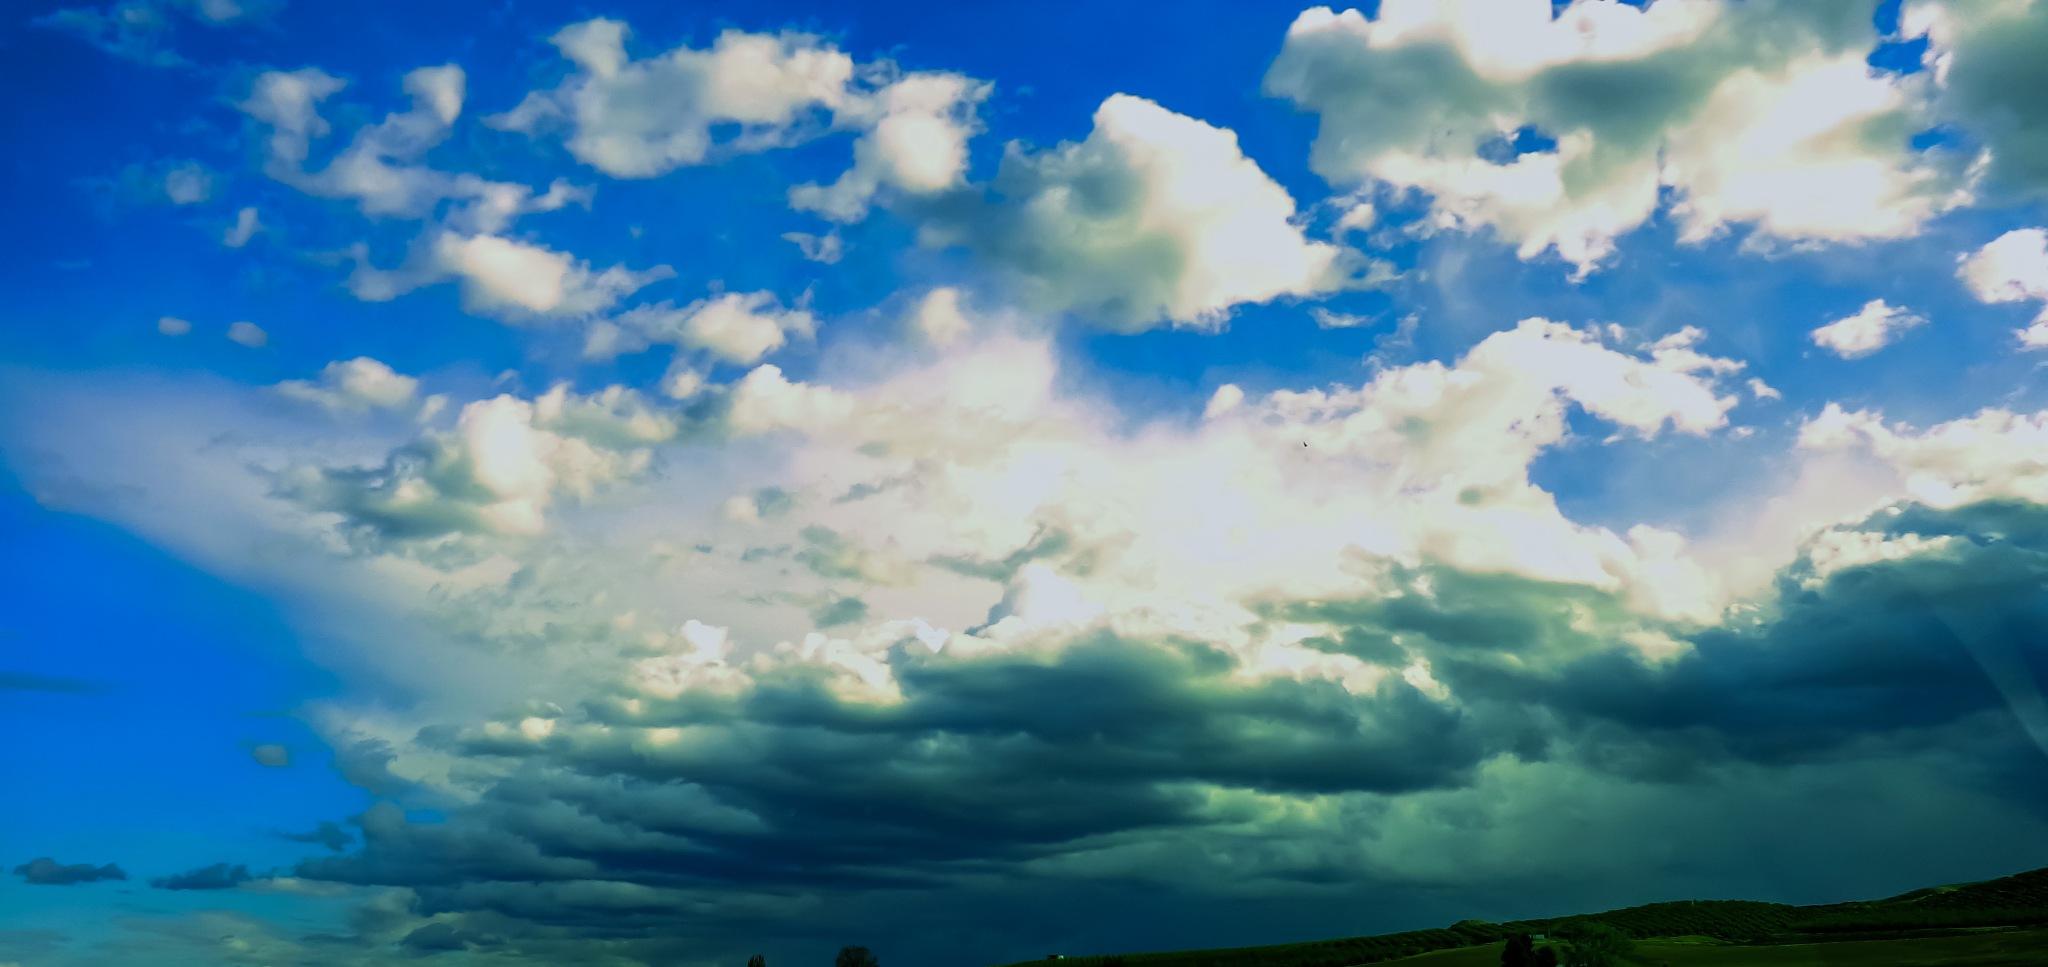 sky blue by mssophiabelladonna